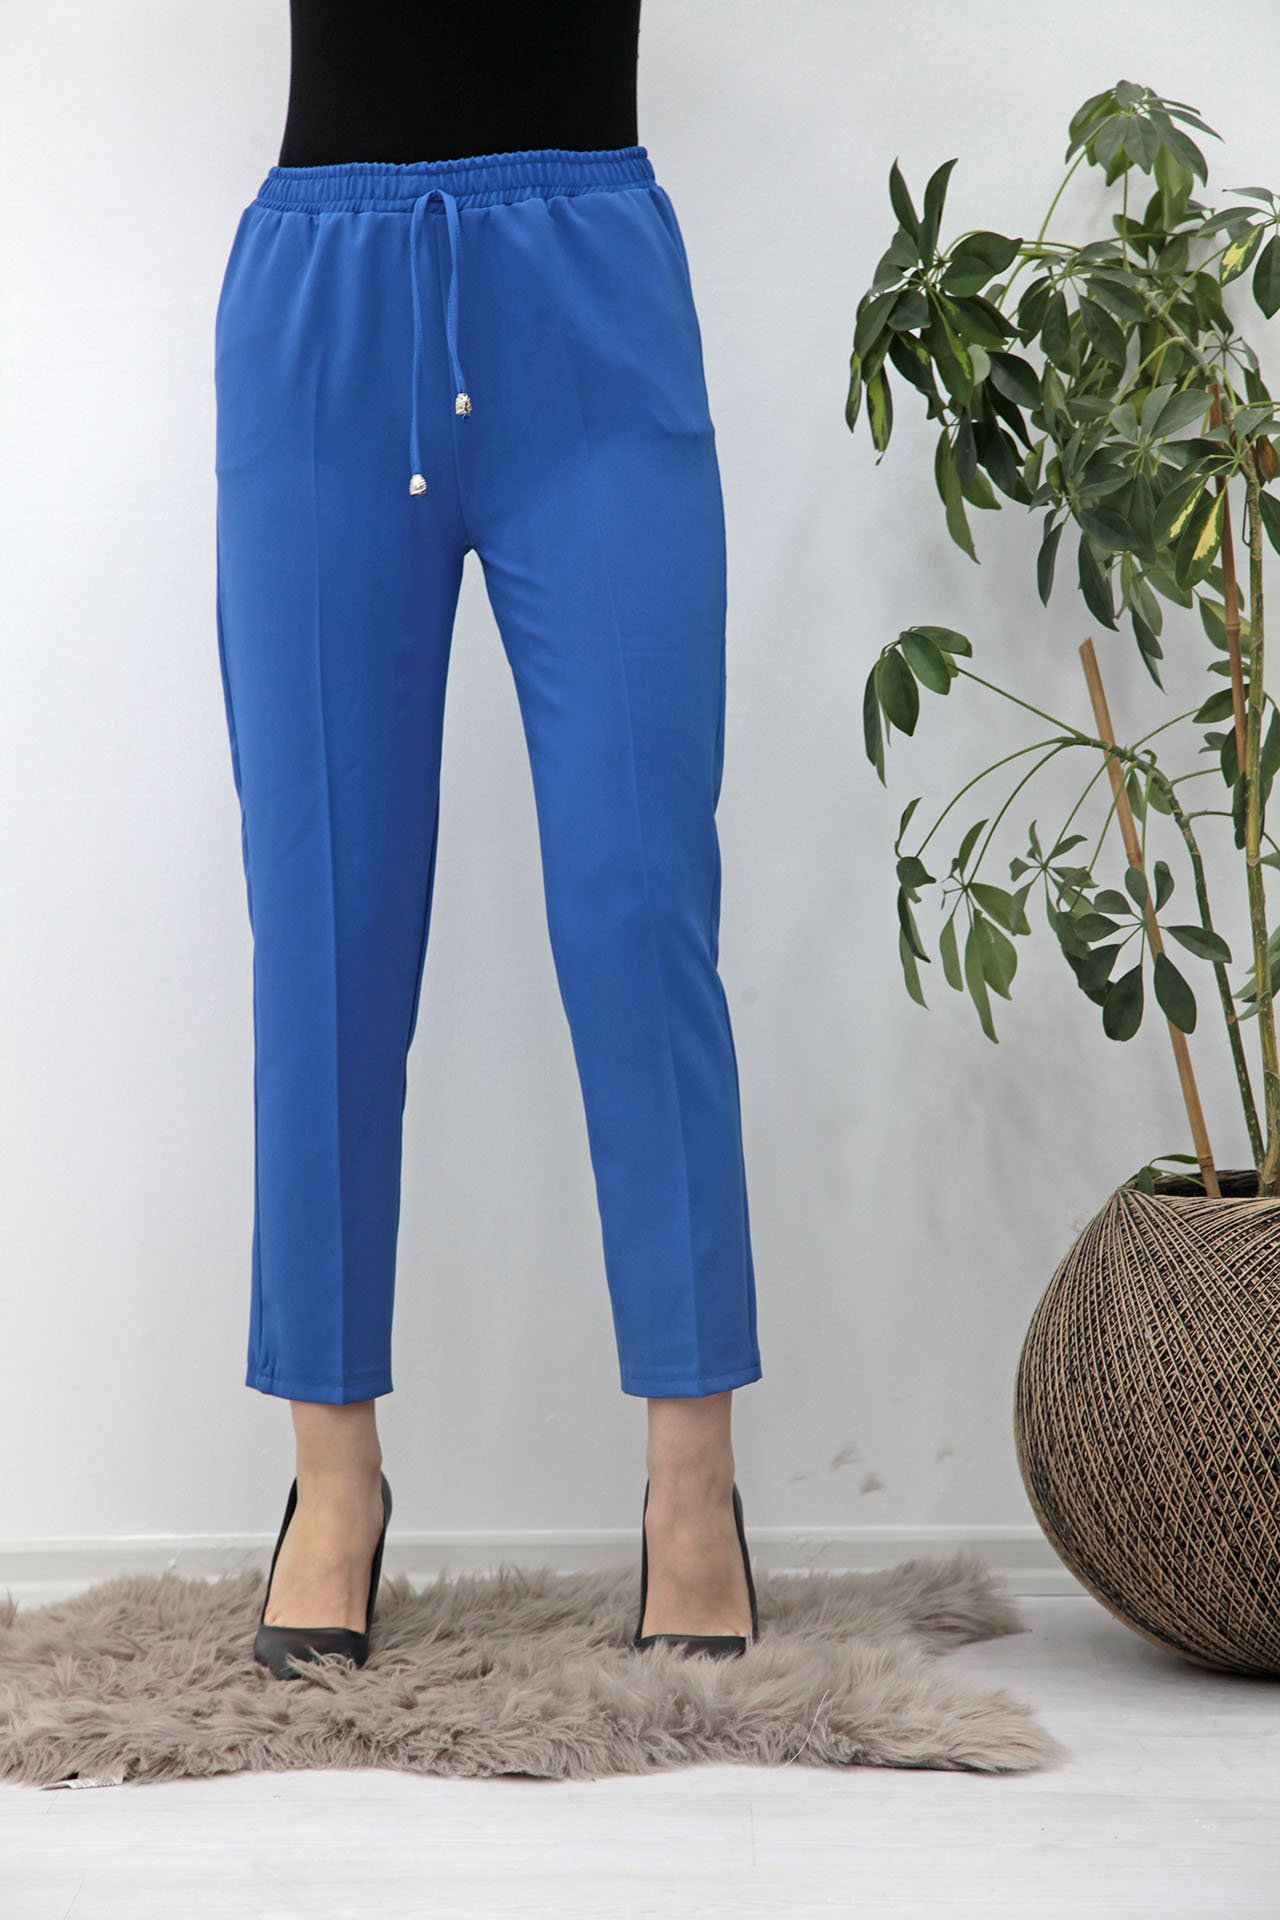 GİZAGİYİM - Beli Lastikli Kalem Pantolon Mavi